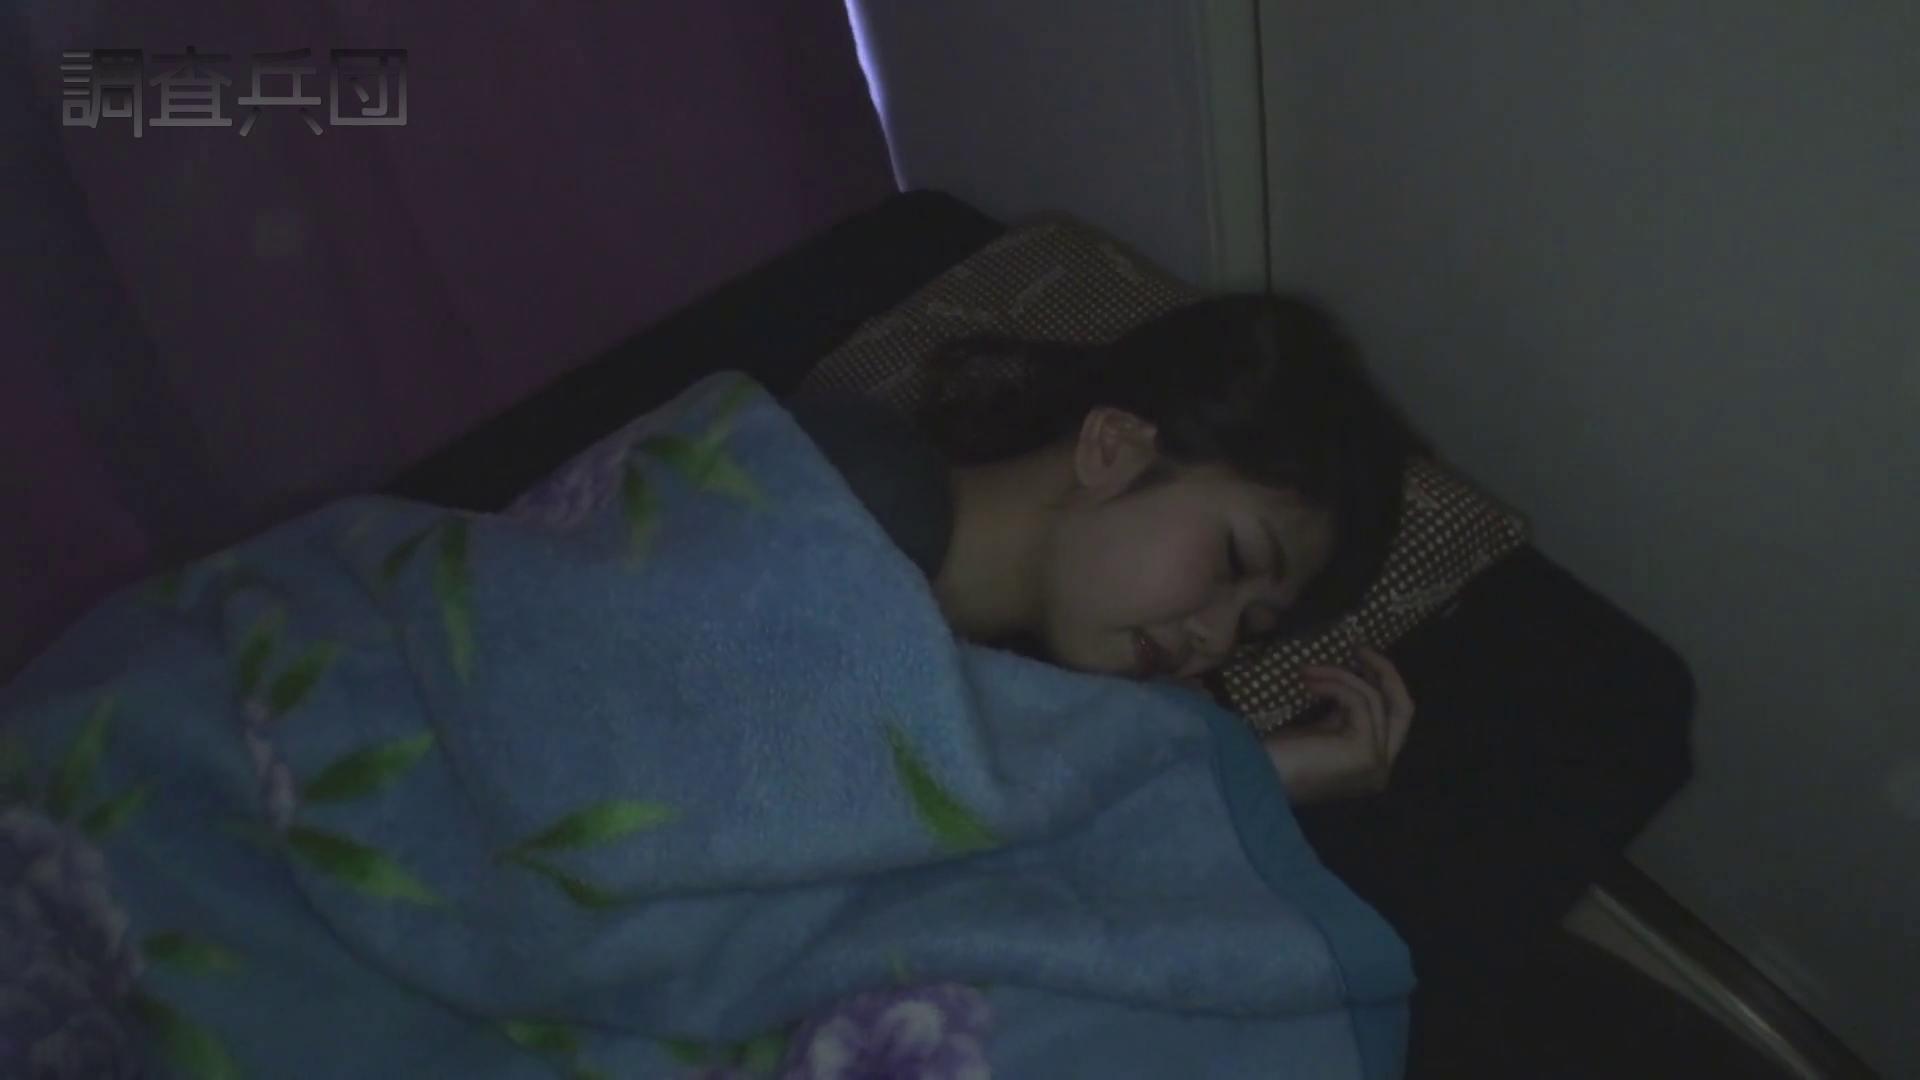 RE:~反撃の悪戯~vol.7 パンケーキ屋バイト・あかり【前編】 盛合せ  78PIX 2